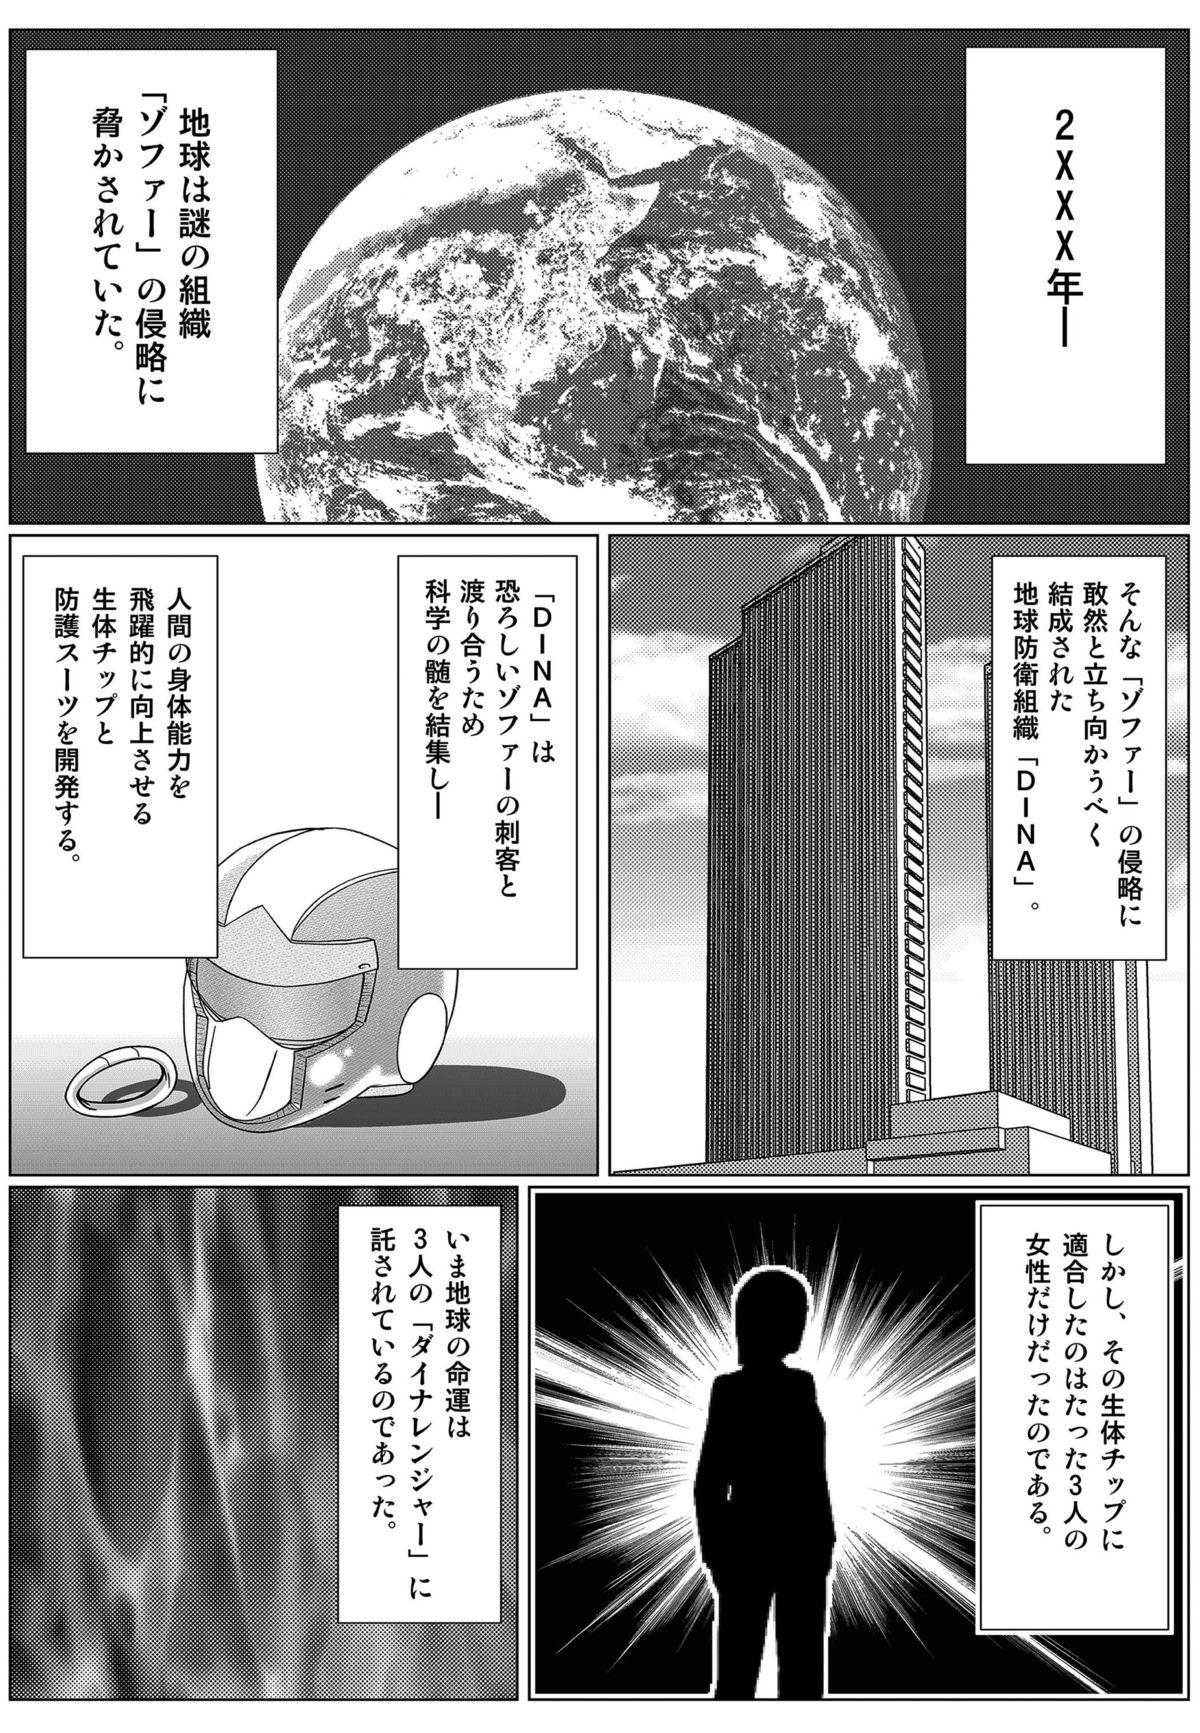 [Macxe's (monmon)] Tokubousentai Dinaranger ~Heroine Kairaku Sennou Keikaku~ Vol.01/02/03 (Renkaban) [Digital] 117